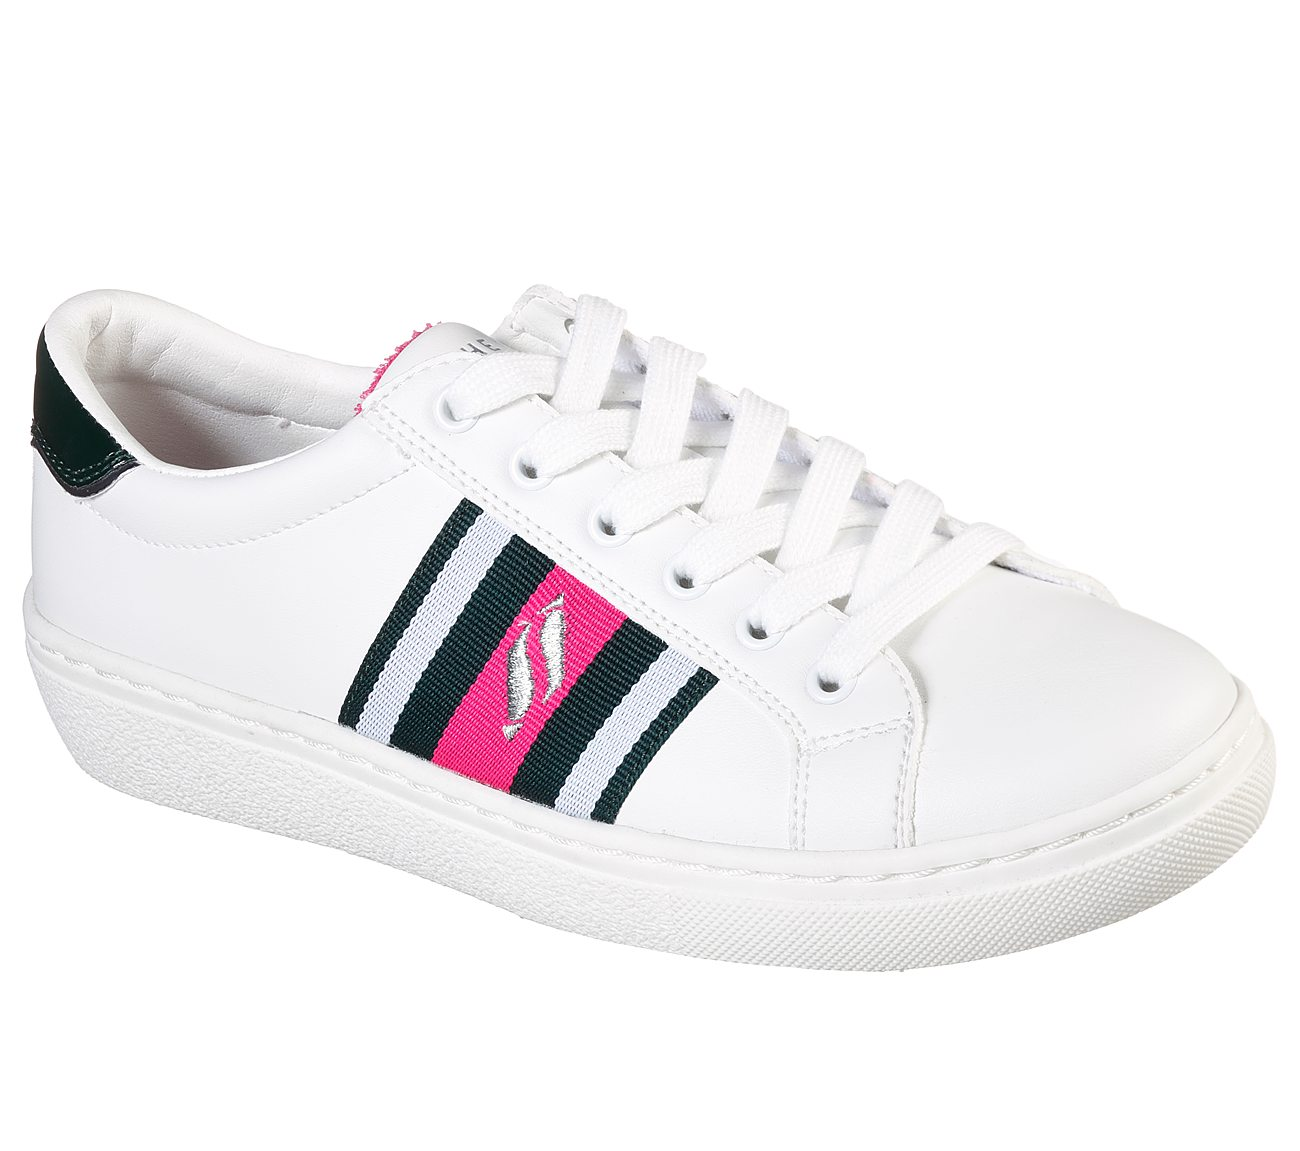 Buy SKECHERS Goldie Collegiate Cruizers SKECHER Street Shoes w68lp